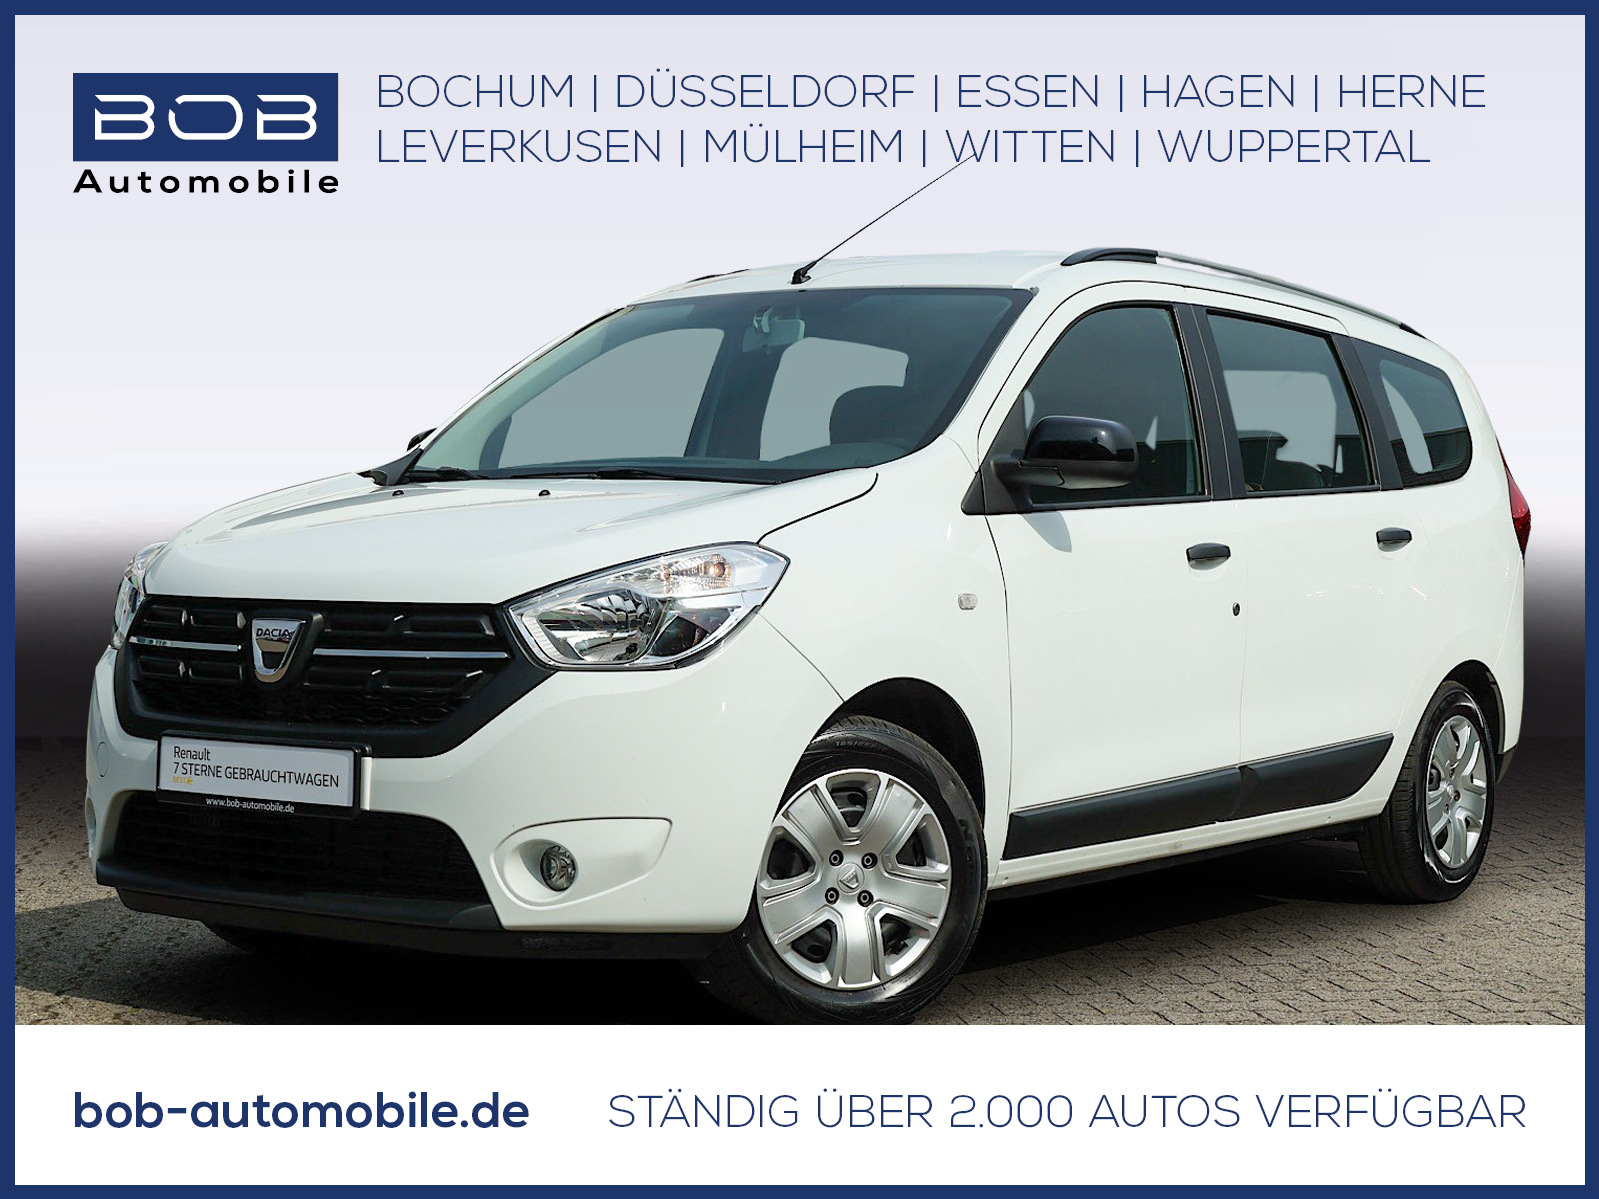 Dacia Lodgy 1.3 TCe 100 Comfort AHK KLIMA BT 5-SITZE, Jahr 2020, Benzin